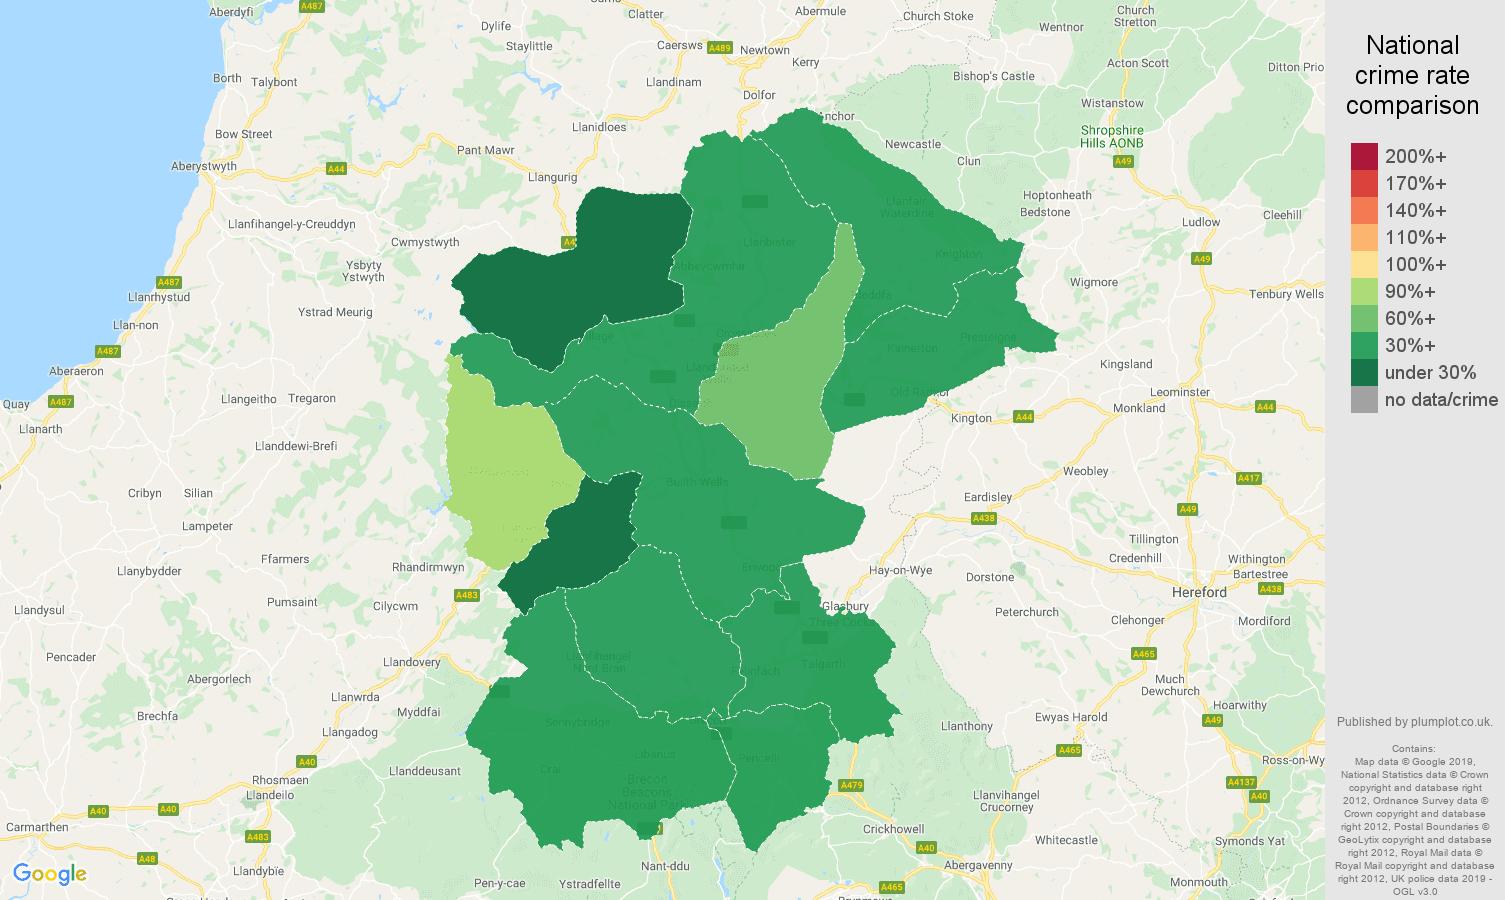 Llandrindod Wells public order crime rate comparison map